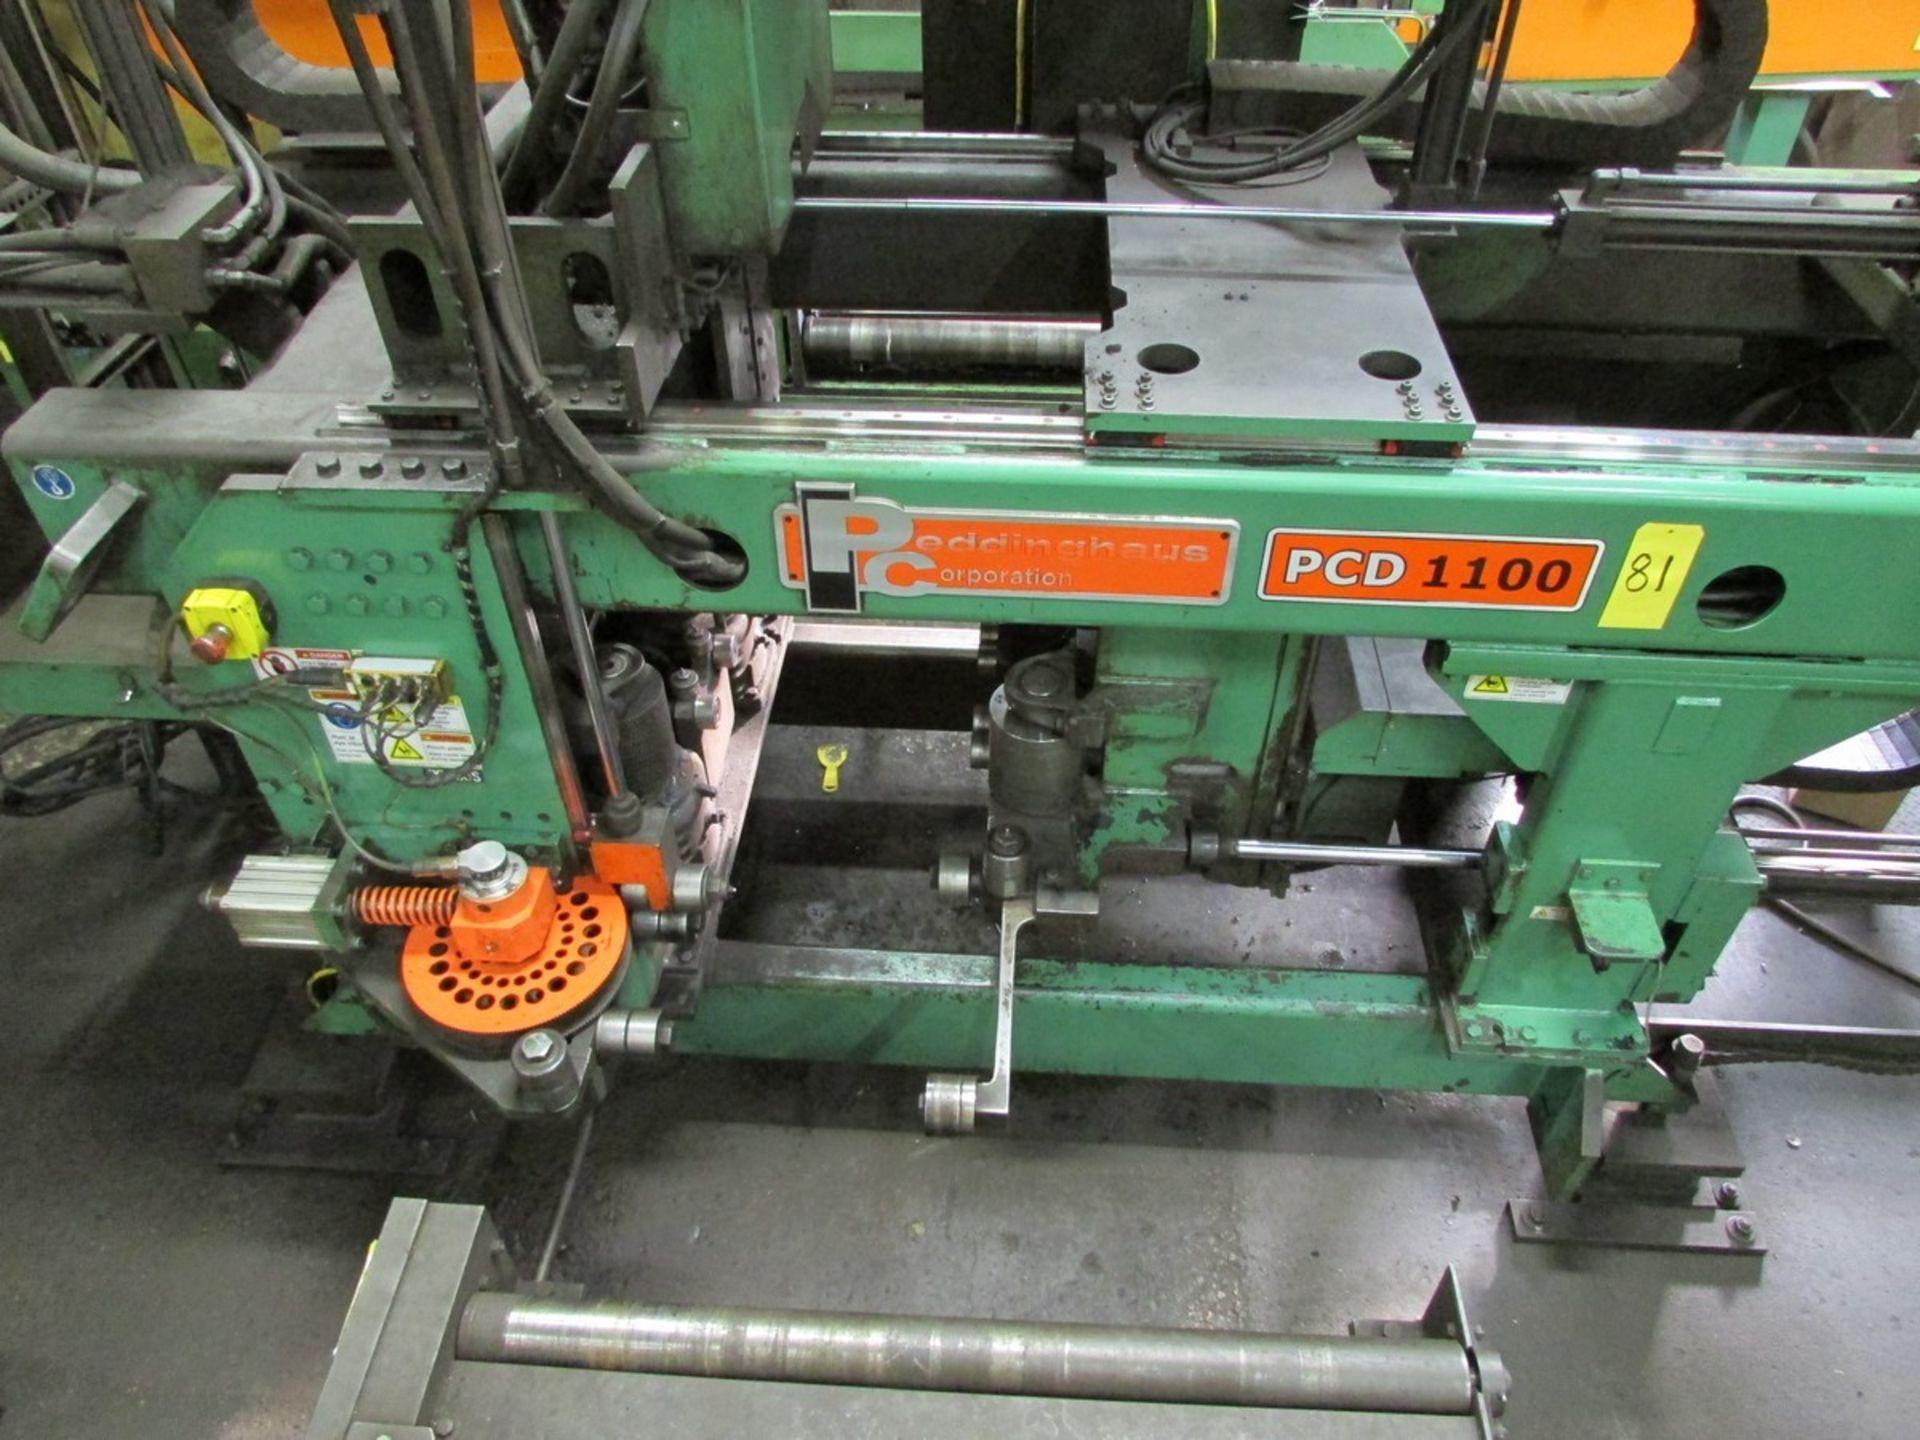 Lot 81 - 2008 Peddinghaus PCD 1100 Beam Drill s/n 7246, 460V/3/60 c/w 575V Step Down Transformer (SUBJECT